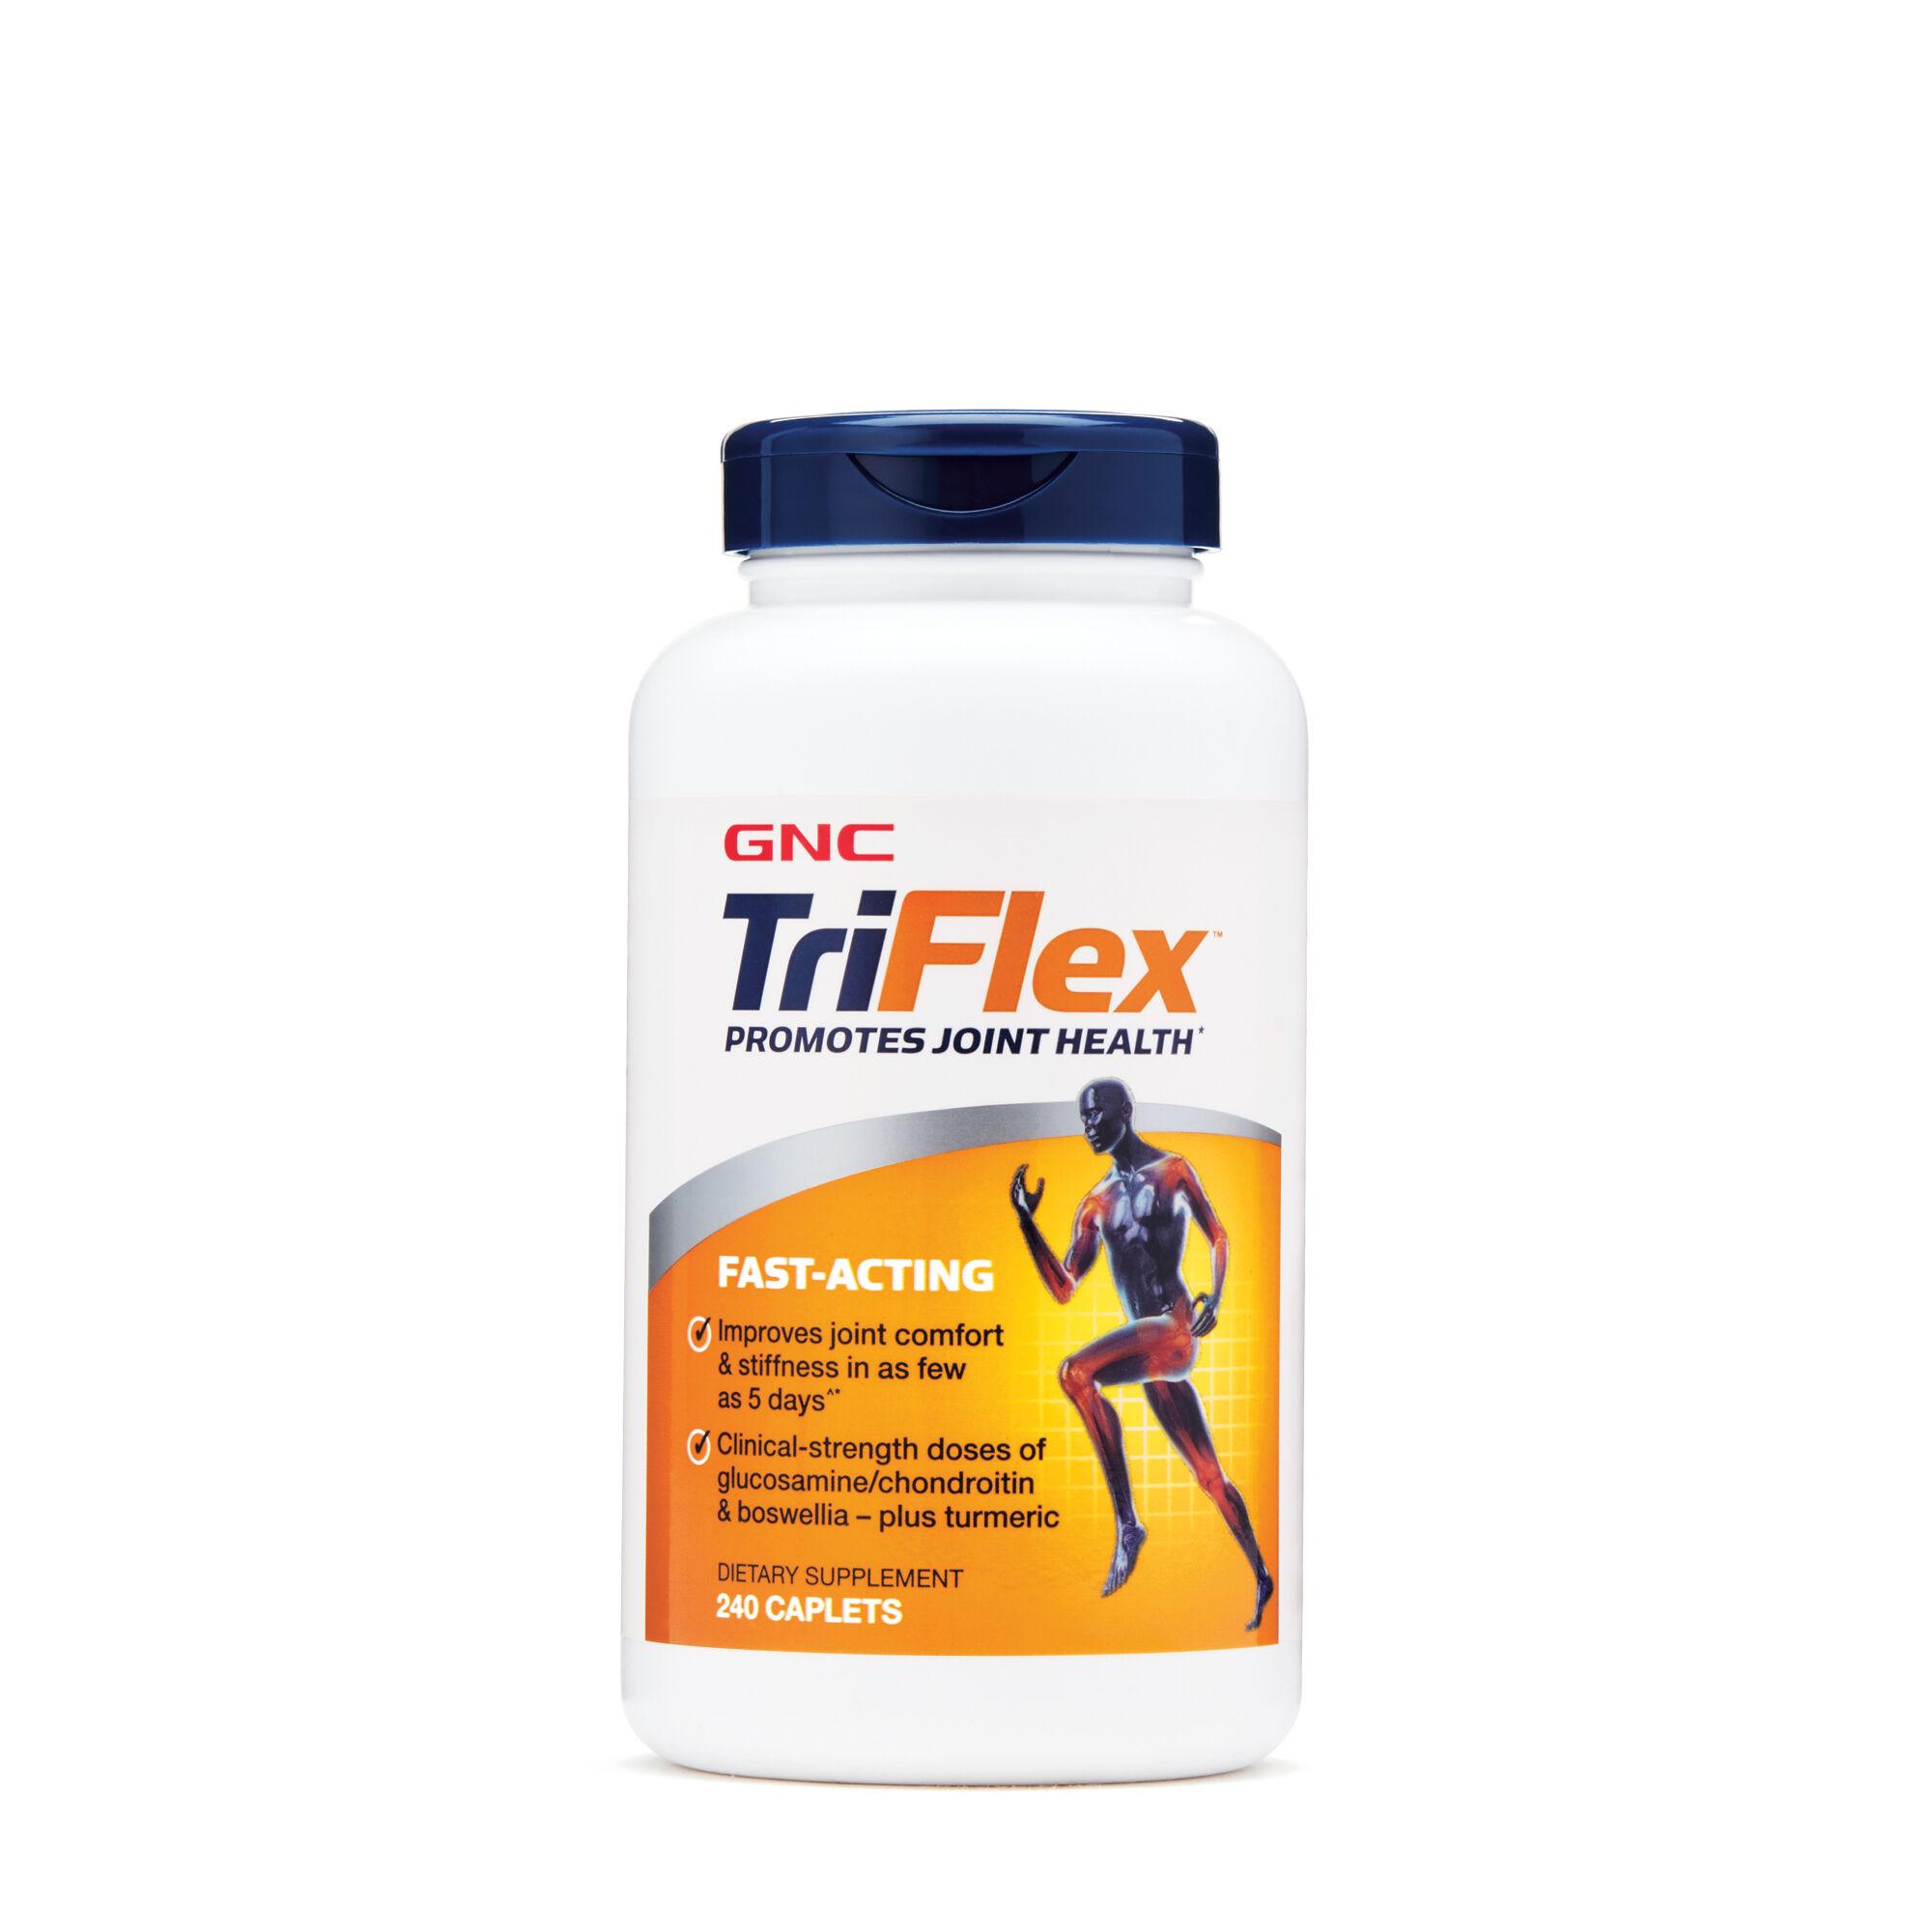 Glucosamine & GNC triflex for healthy joints